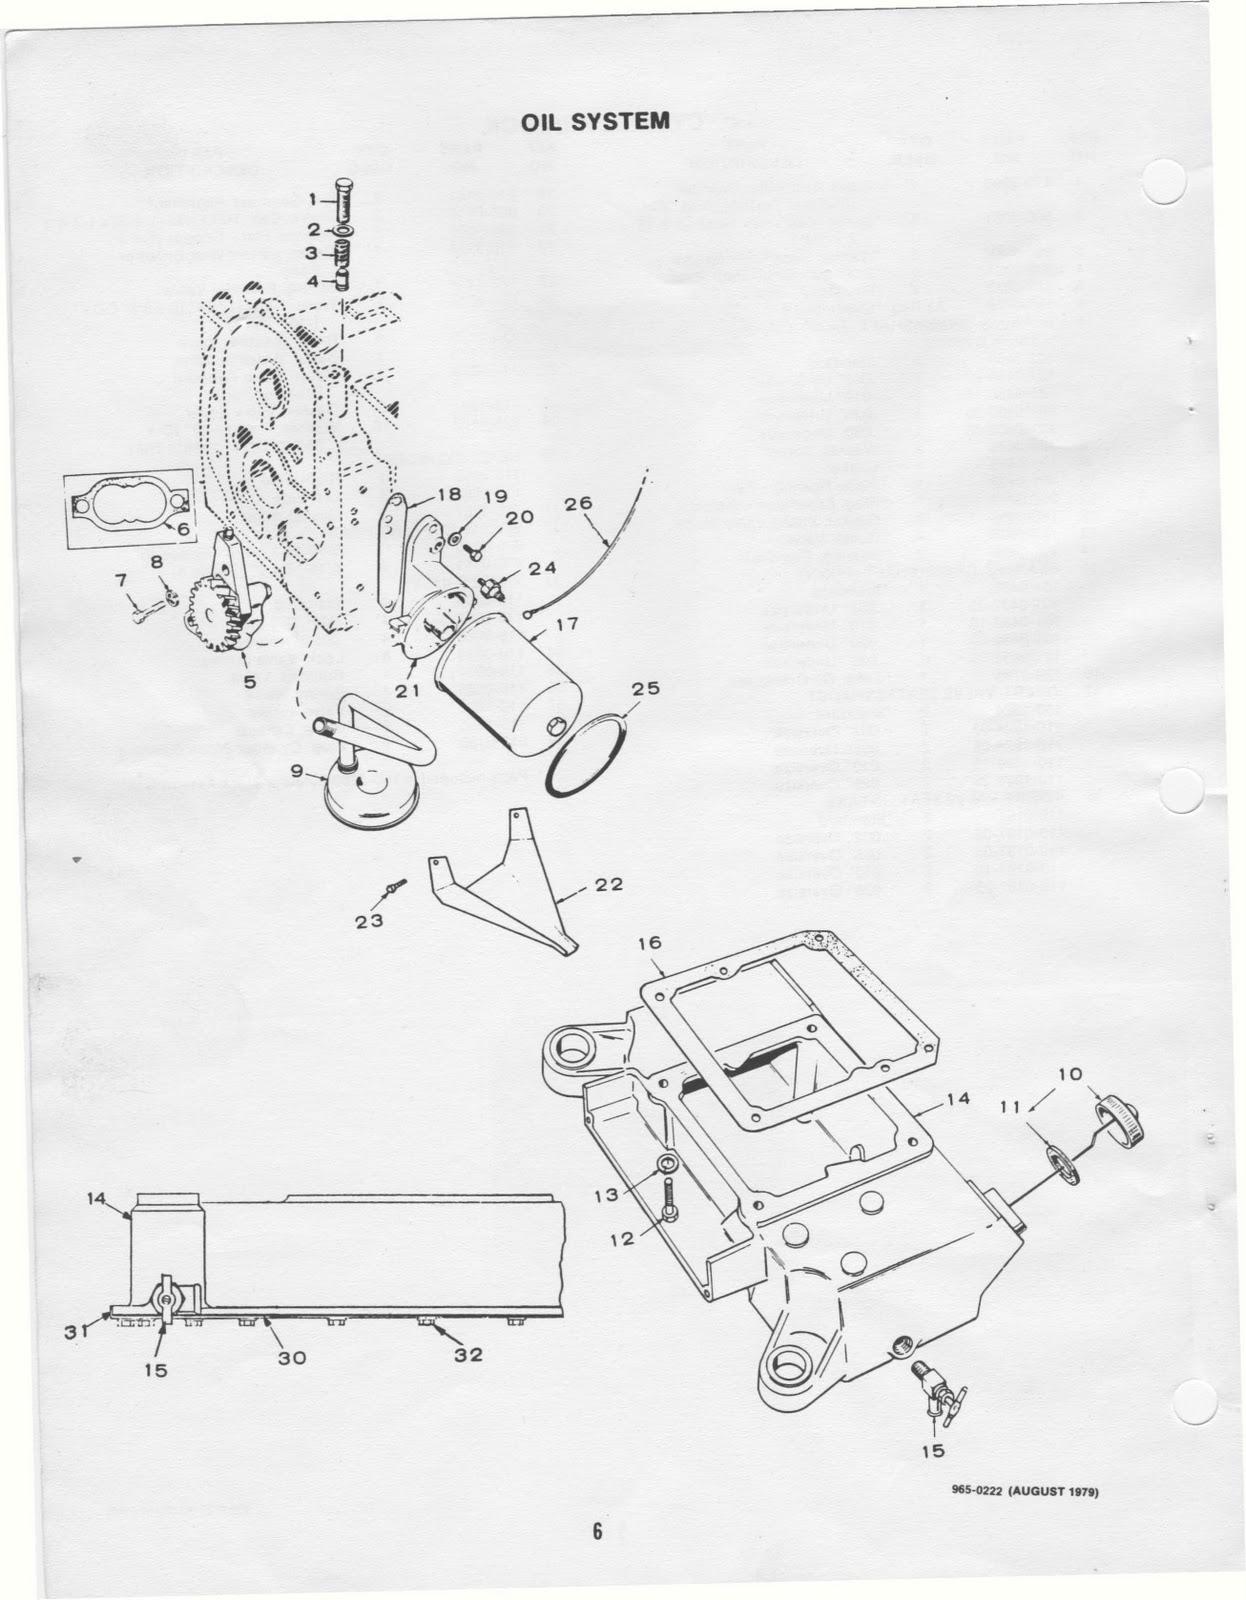 Cummins Isb Cm850 Wiring Diagram